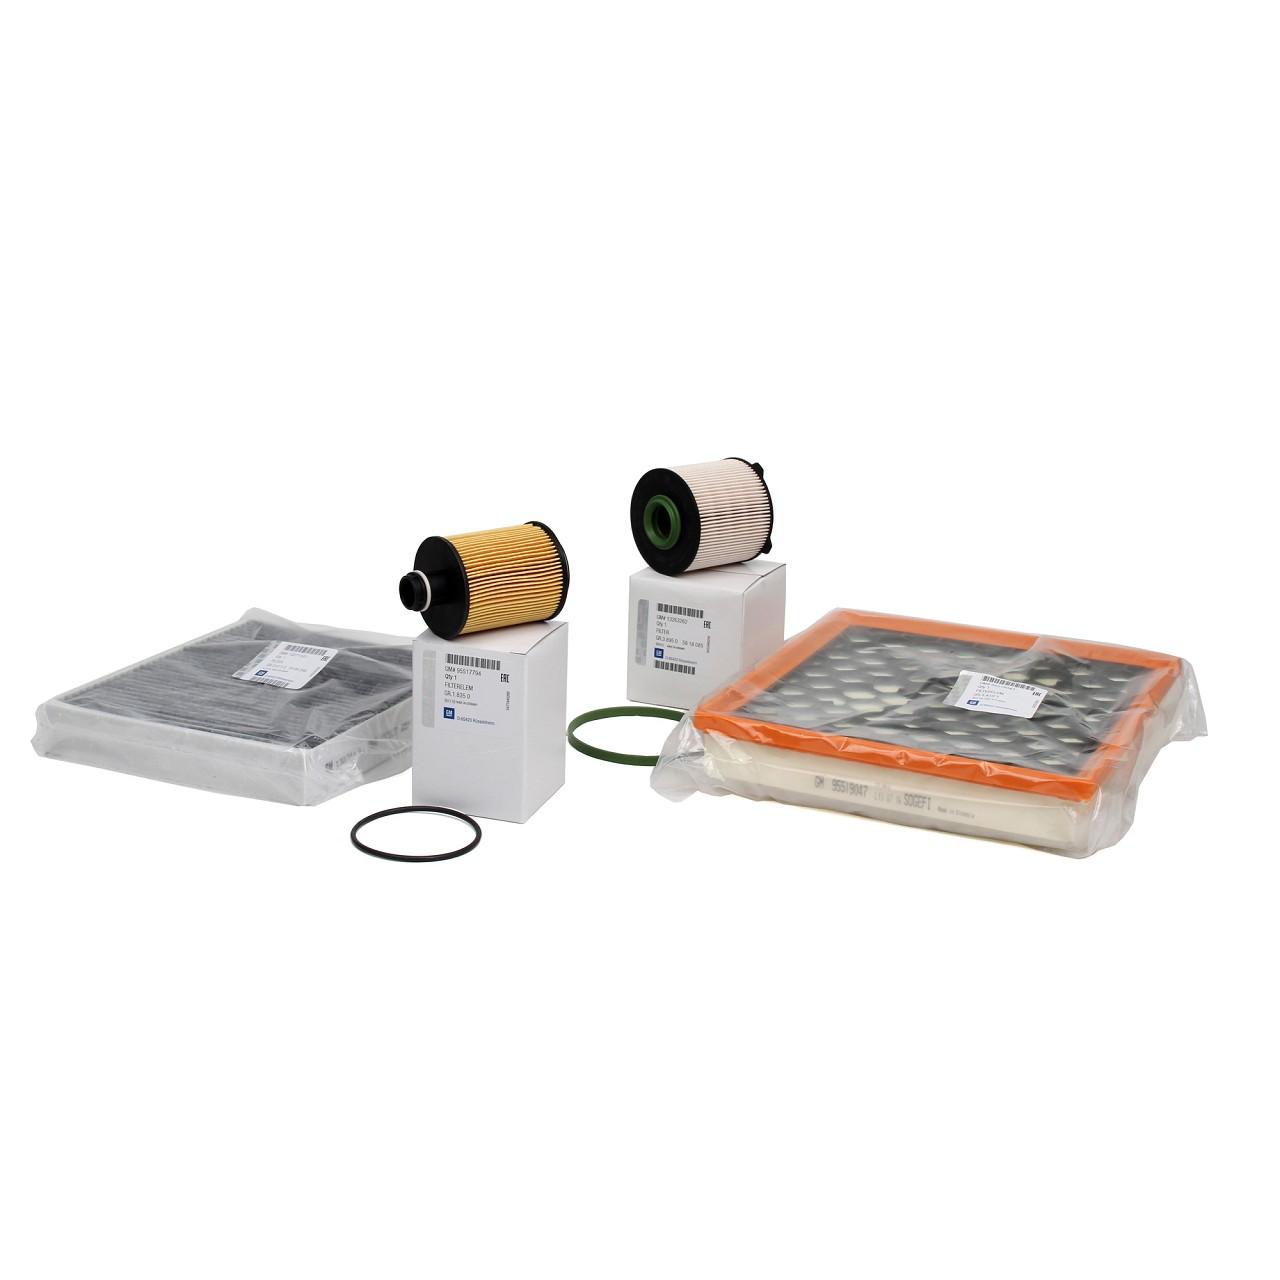 ORIGINAL GM Opel Inspektionskit Filterpaket INSIGNIA A 2.0 CDTI 110-163 PS